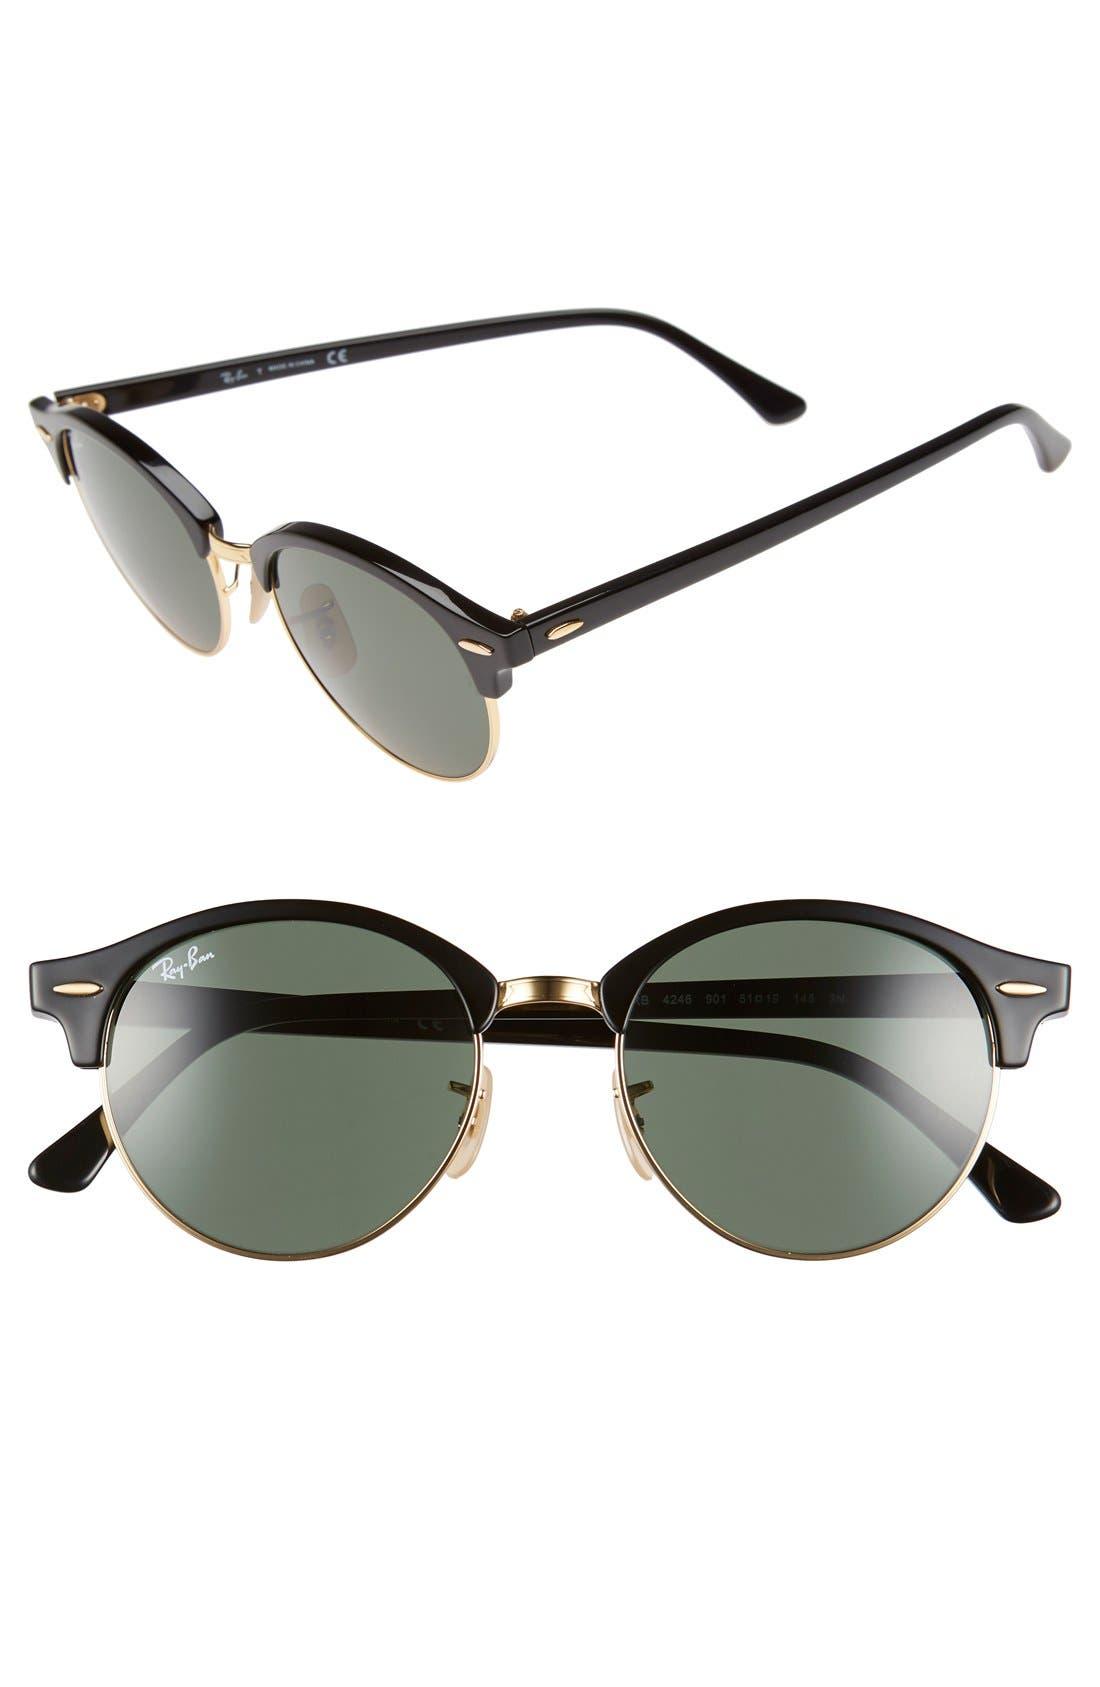 Ray-Ban Clubround 51mm Round Sunglasses